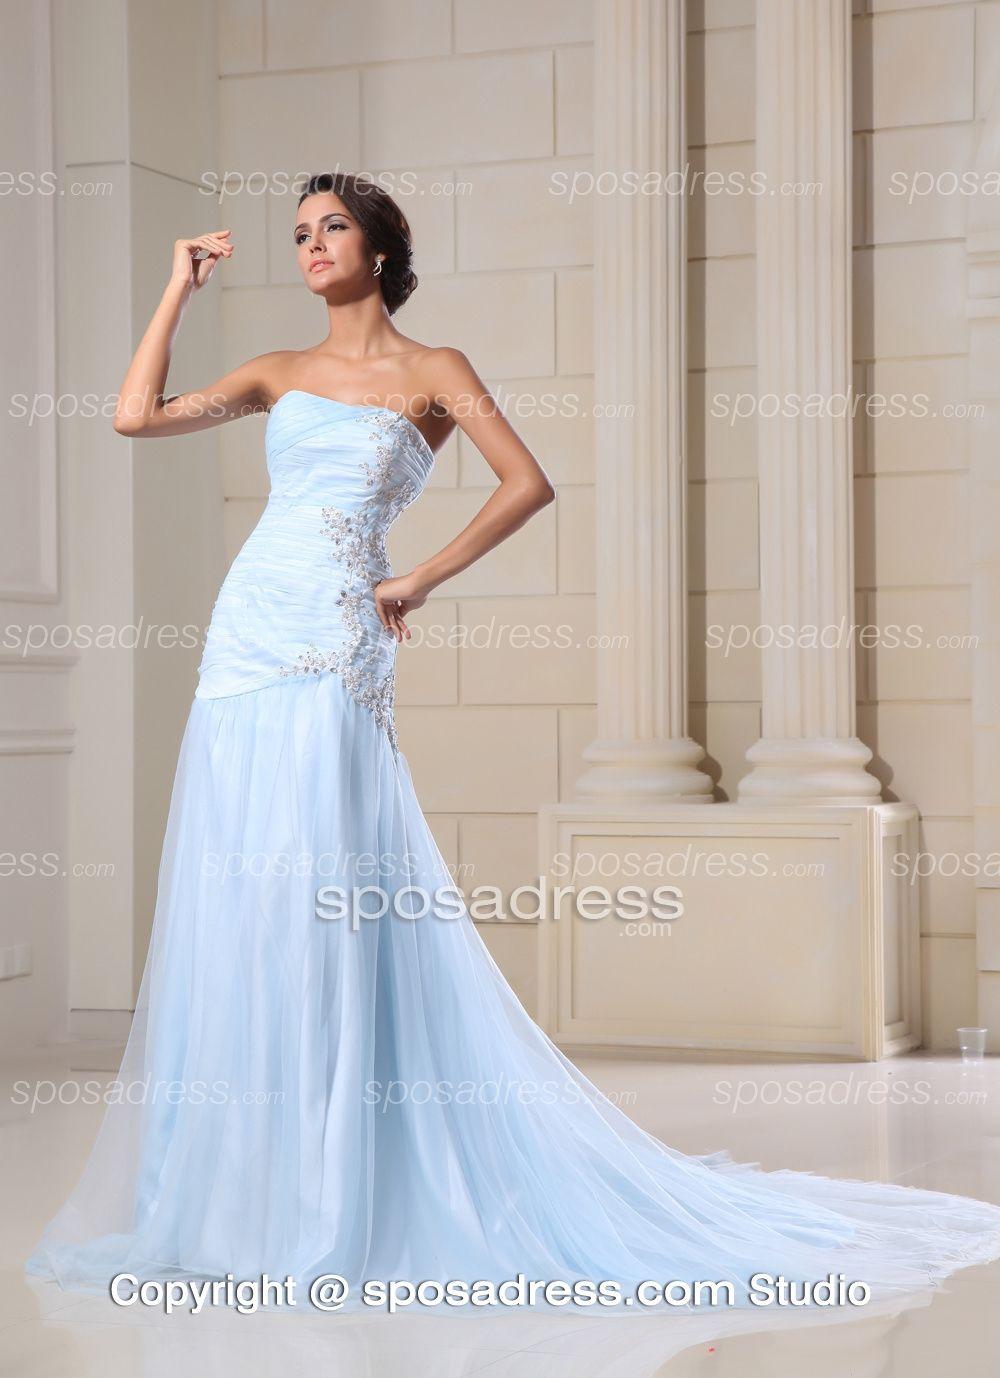 Slightly Long Light Blue Wedding Dress